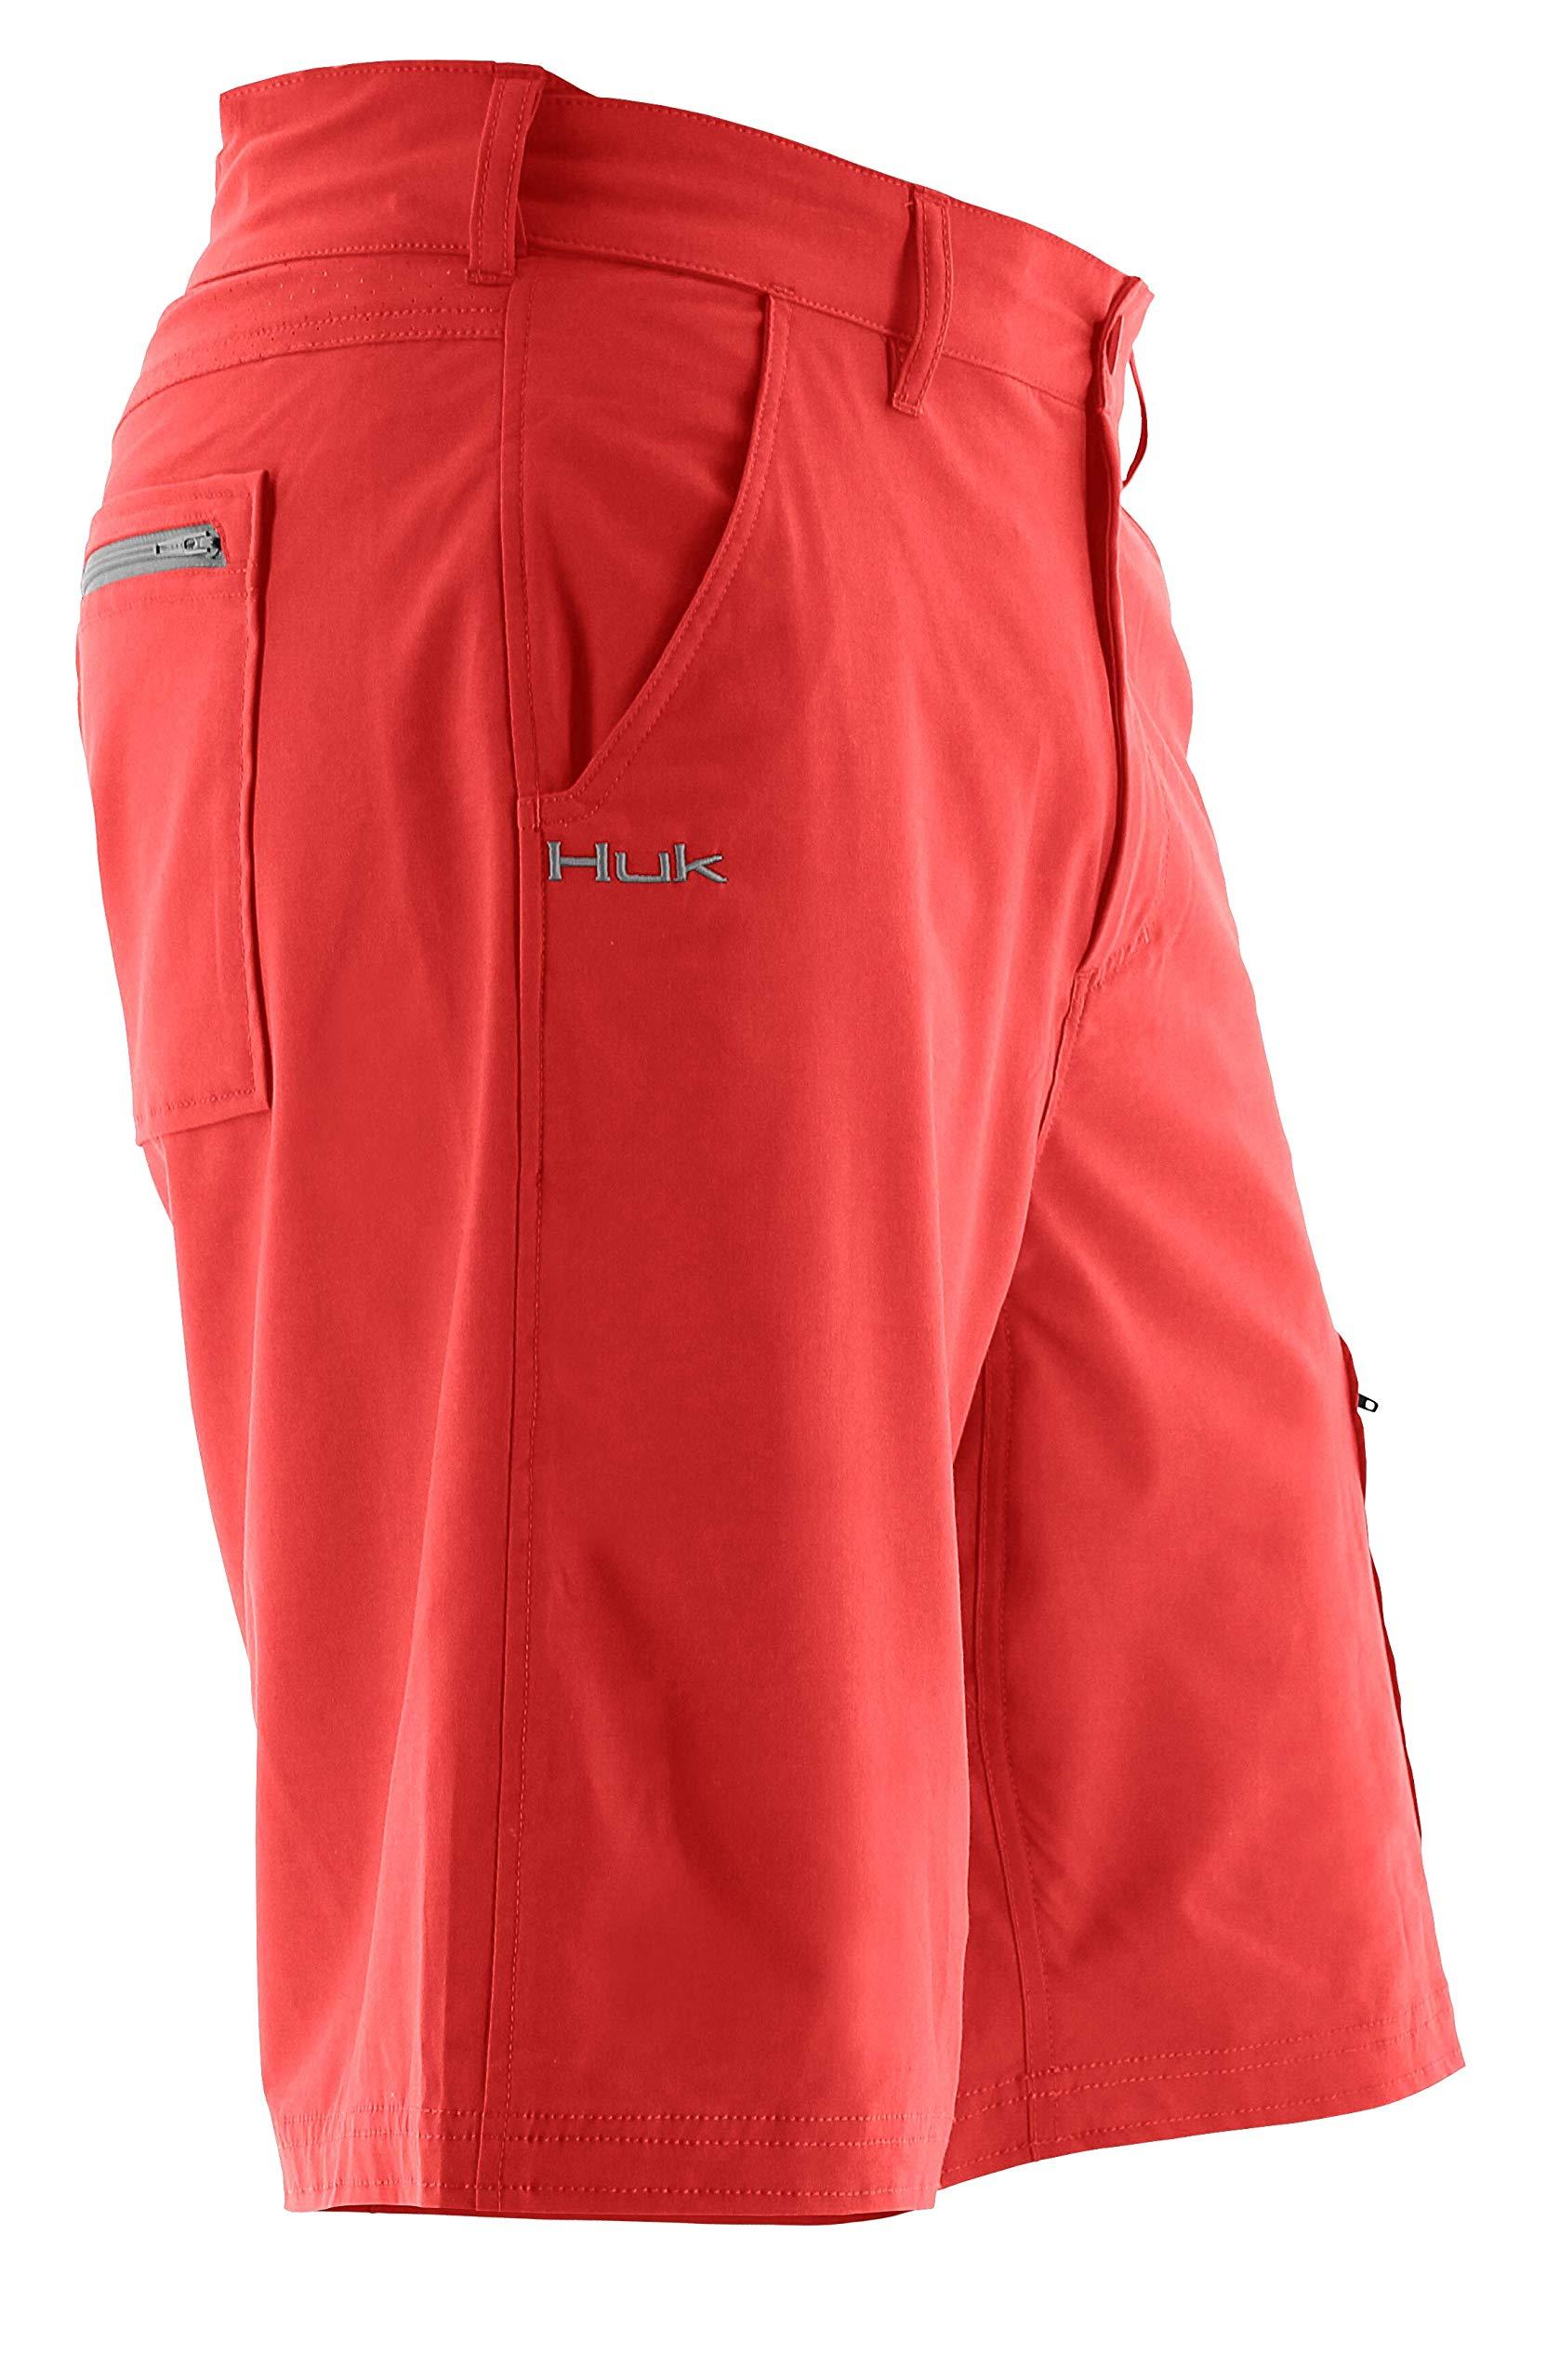 Huk NXTLVL 10.5'' Men's Short, Coral, X-Large